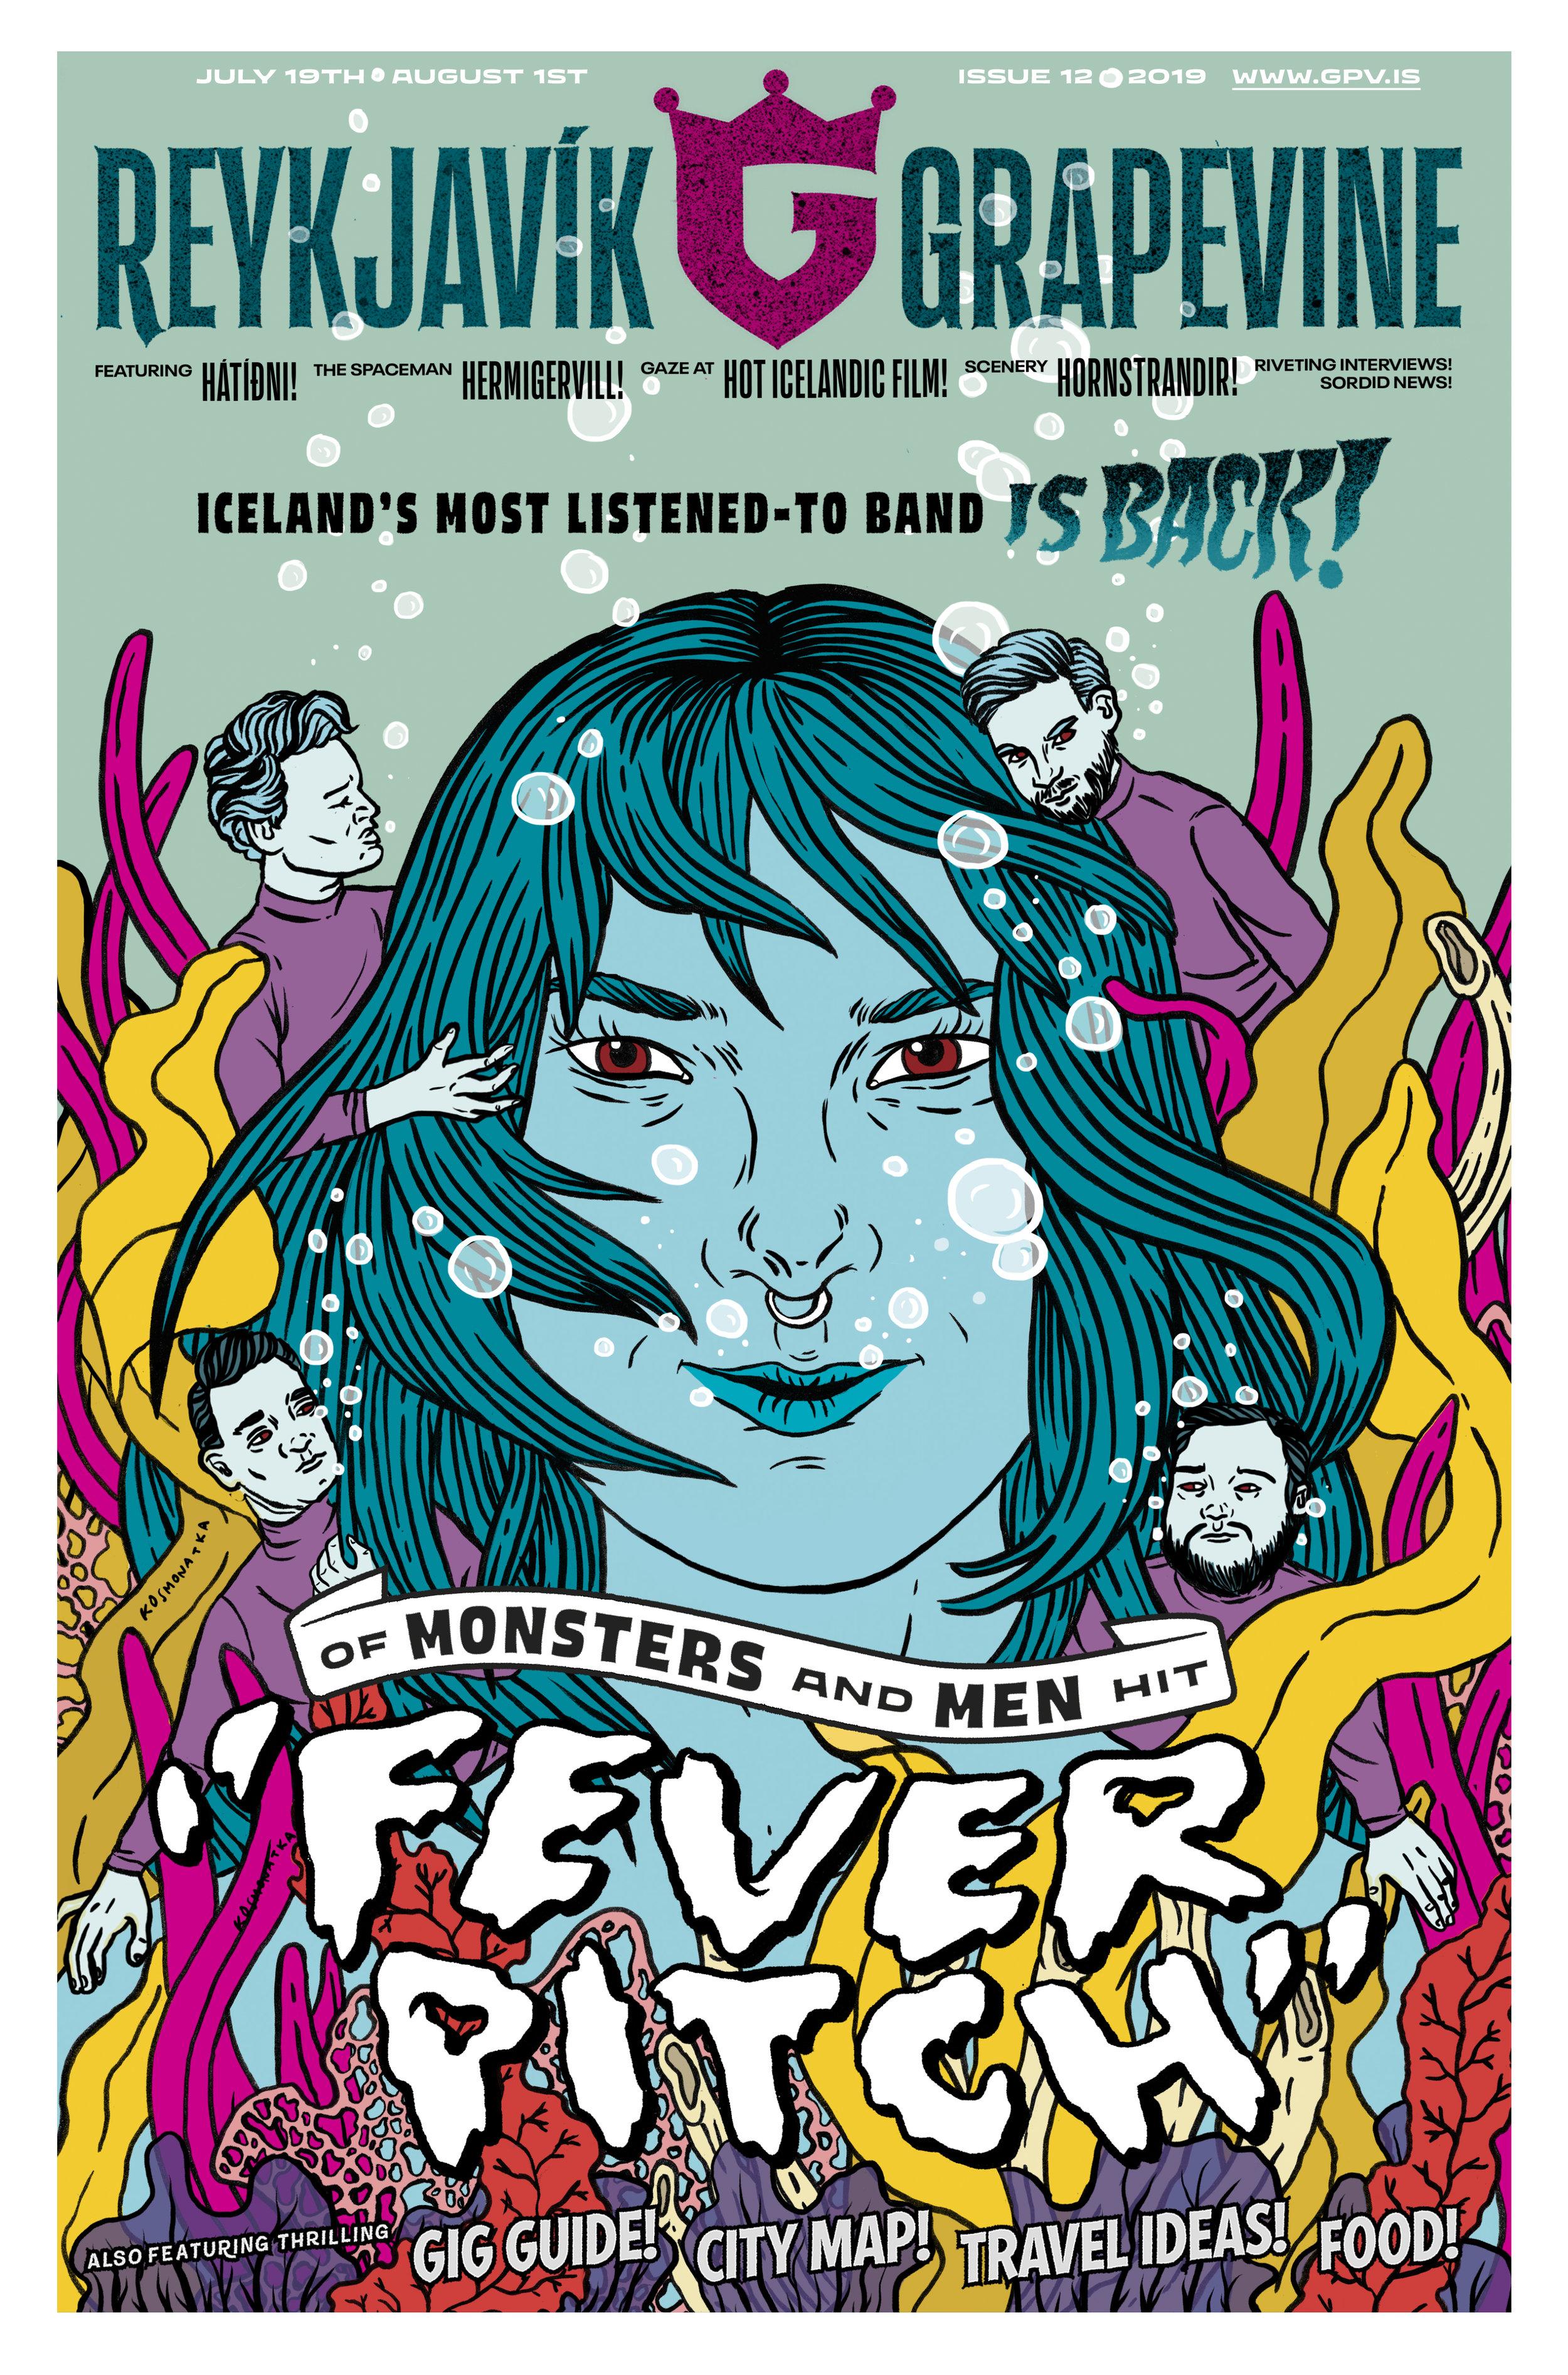 The Reykjavik Grapevine cover illustration